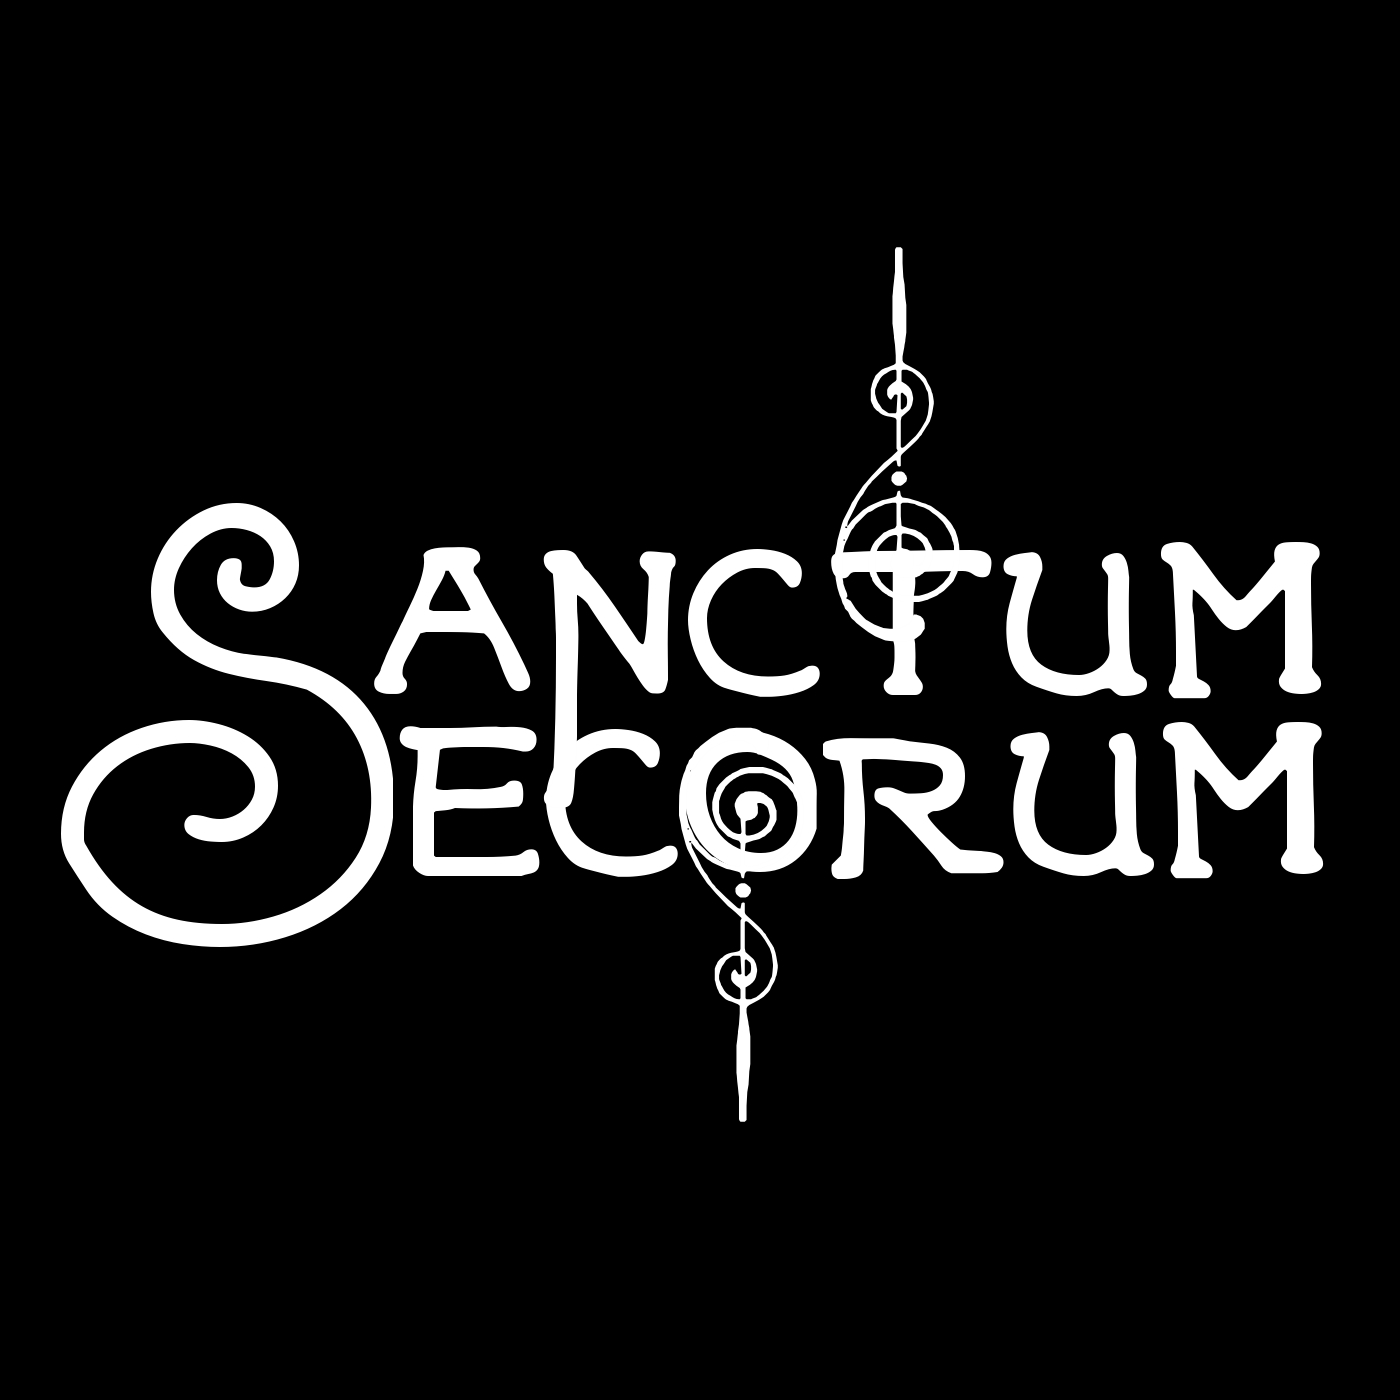 Sanctum Secorum #15a - Goodman Games Appendix N Seminar